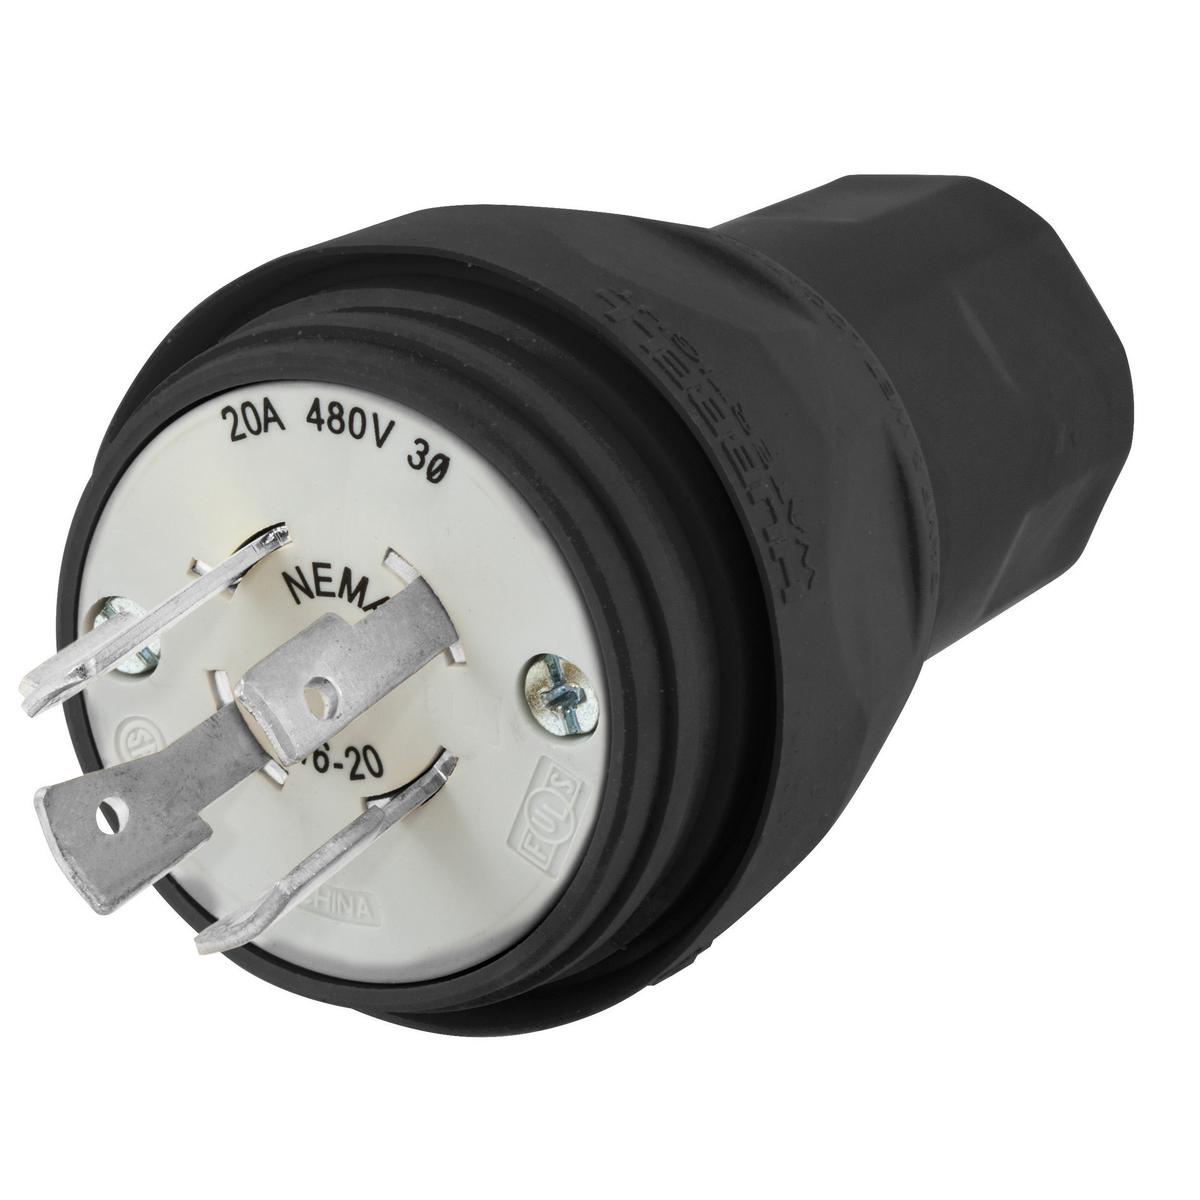 Hubbell HBL26W76BK Plug, w/TIGHT, 3P 20A 480V, L16-20P, BK